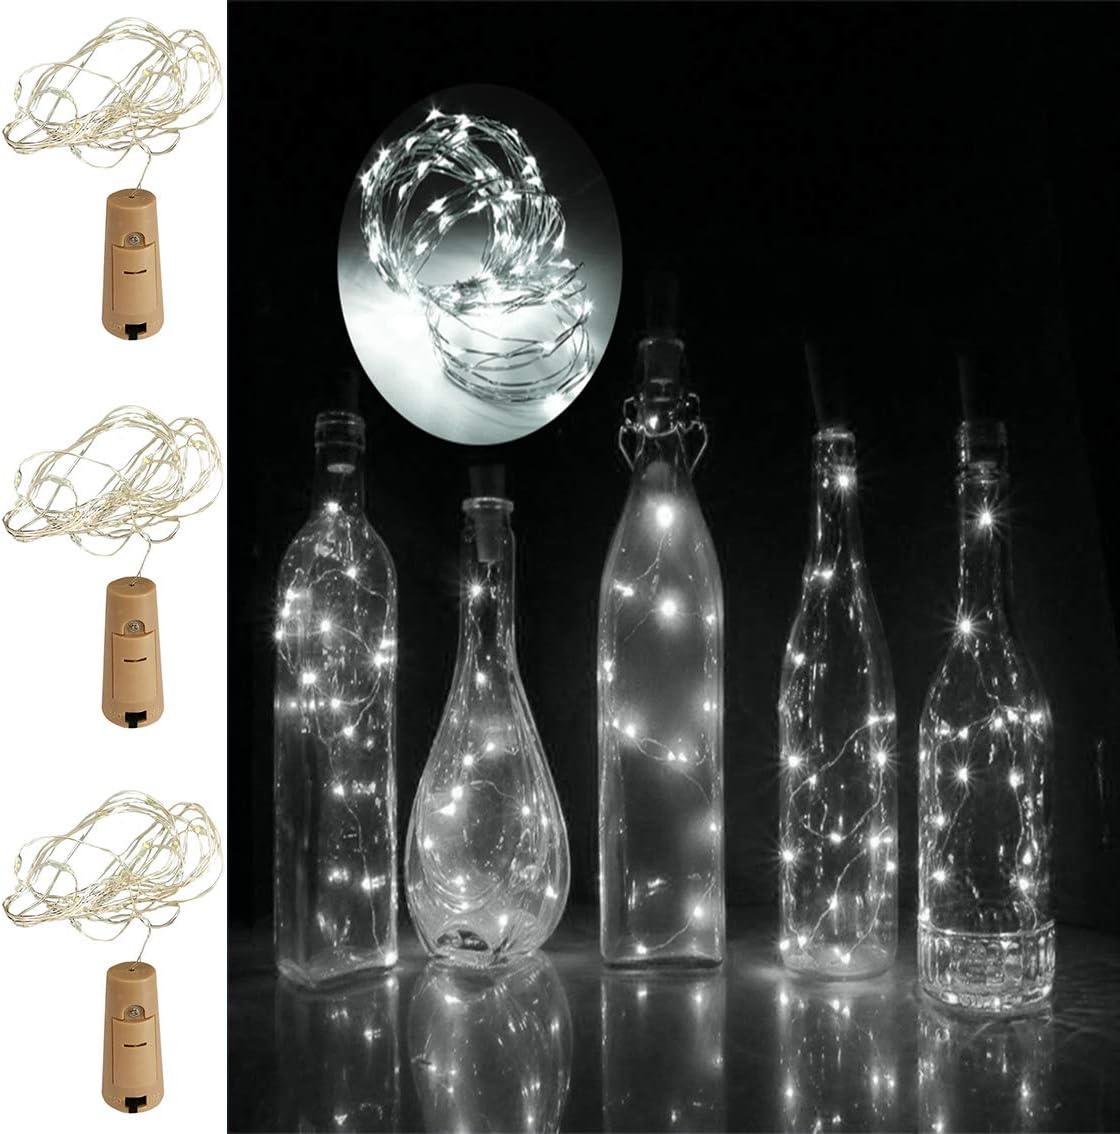 PeiQila - Luces LED para Botella de Vino con Corcho, Funciona con ...